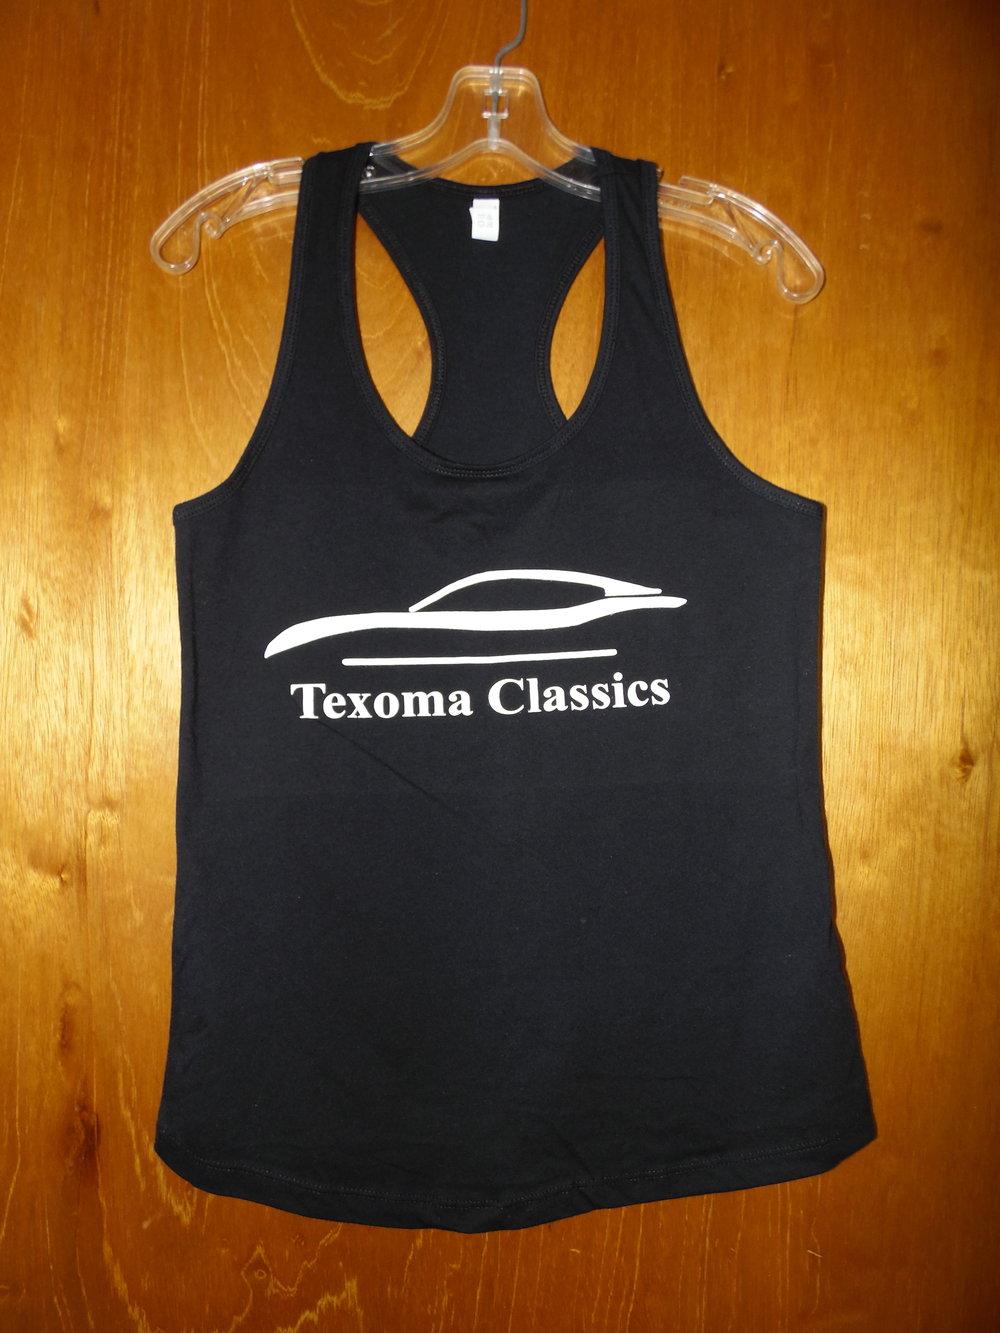 Texoma Classics Womens Tanks